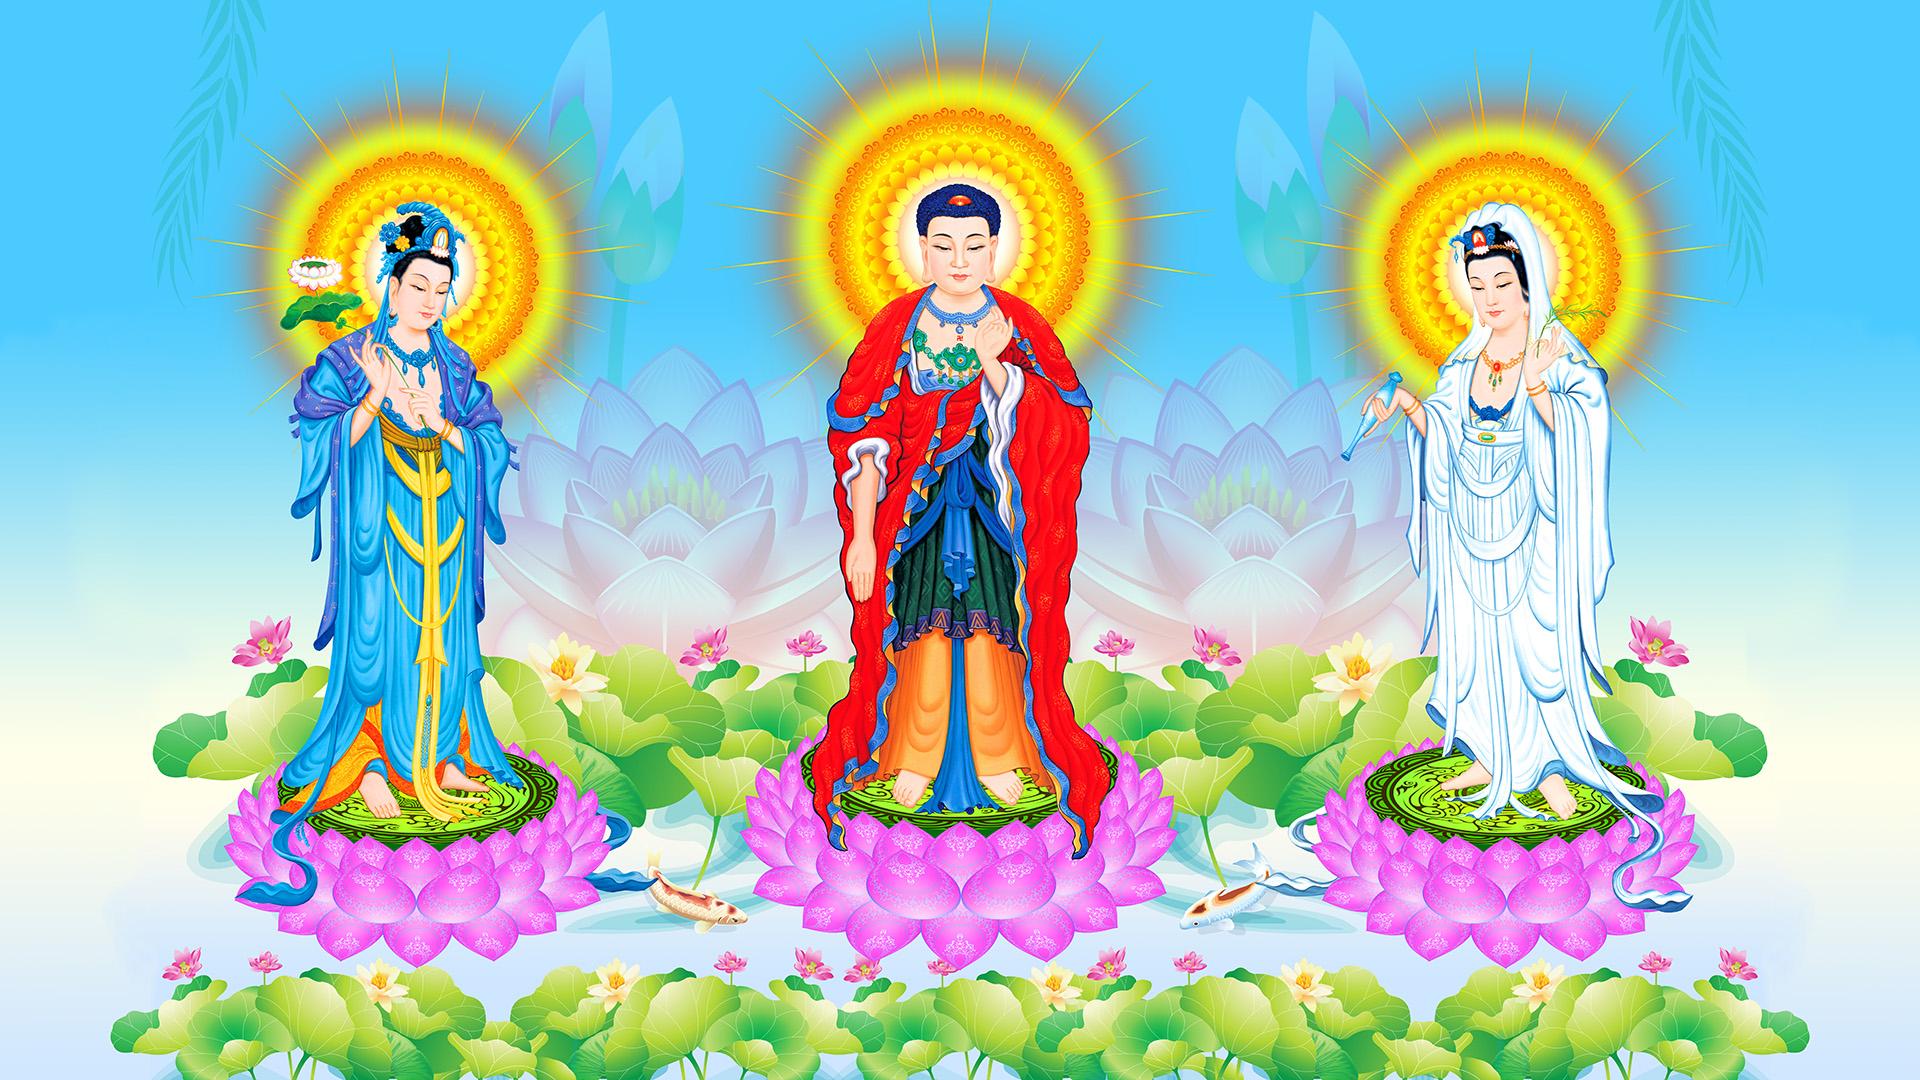 Tay-Phuong-Tam-Thanh-04